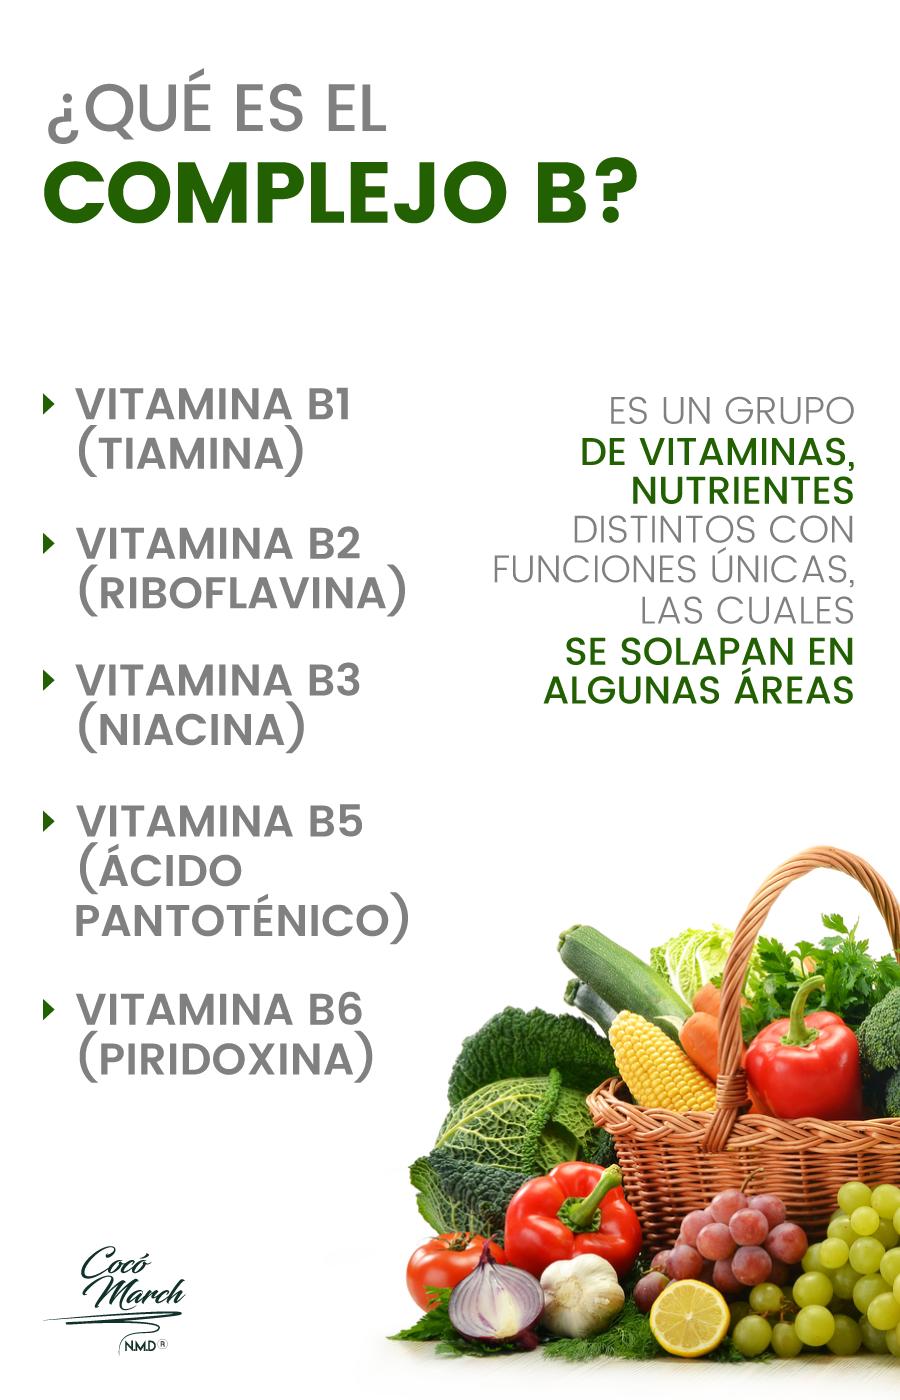 para que sirve solfa syllable vitamina b12 b6 y b1